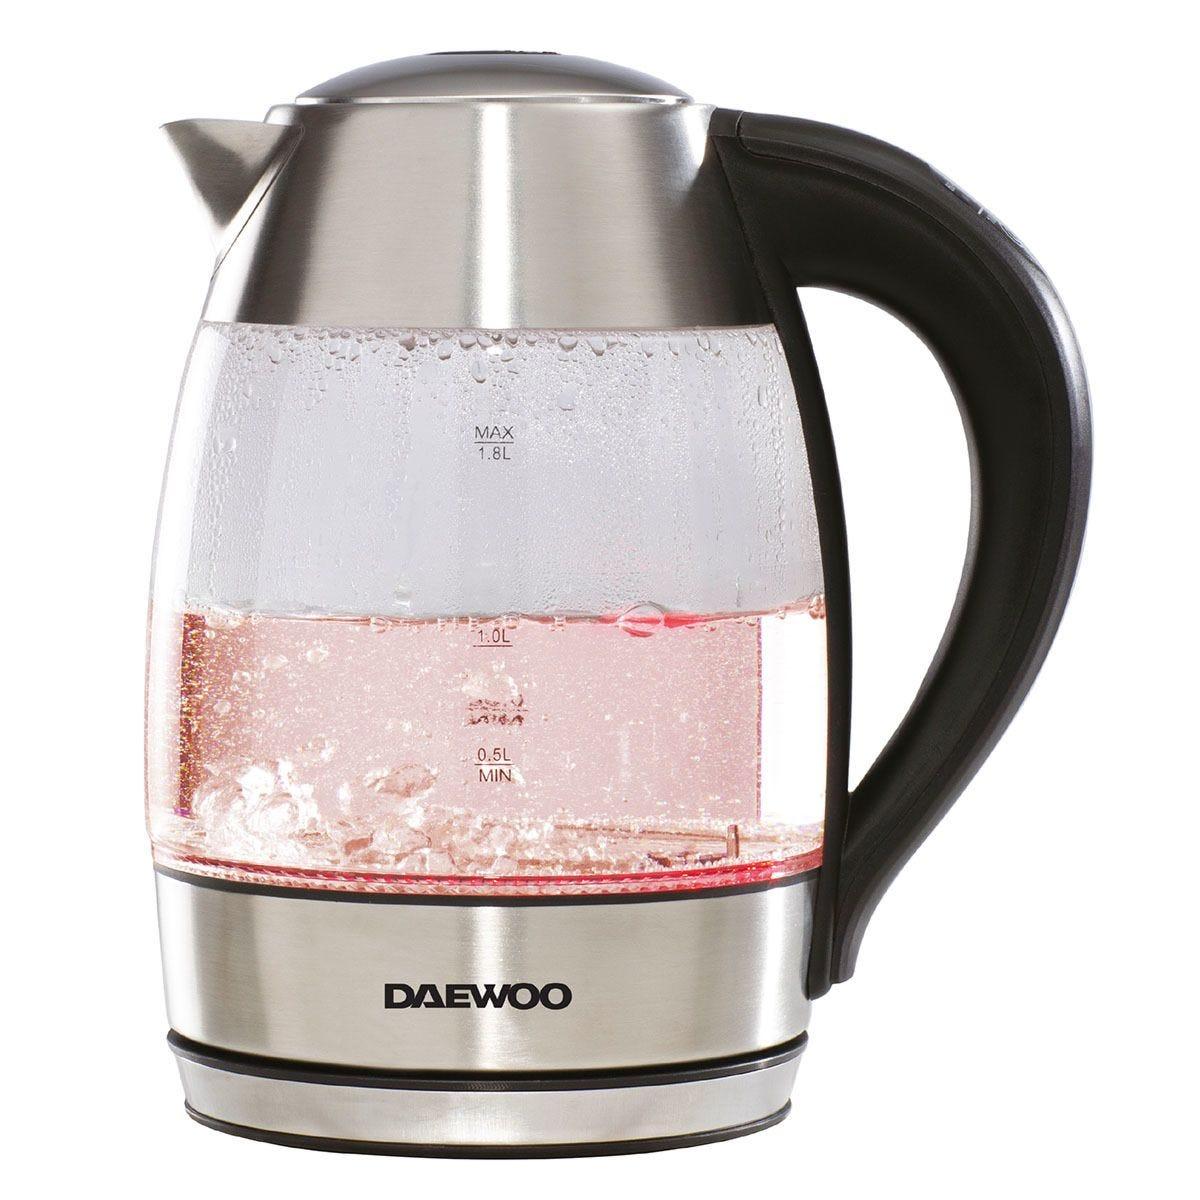 Daewoo SDA1670 2200W Digital Temperature Control 1.8L Kettle - Stainless Steel